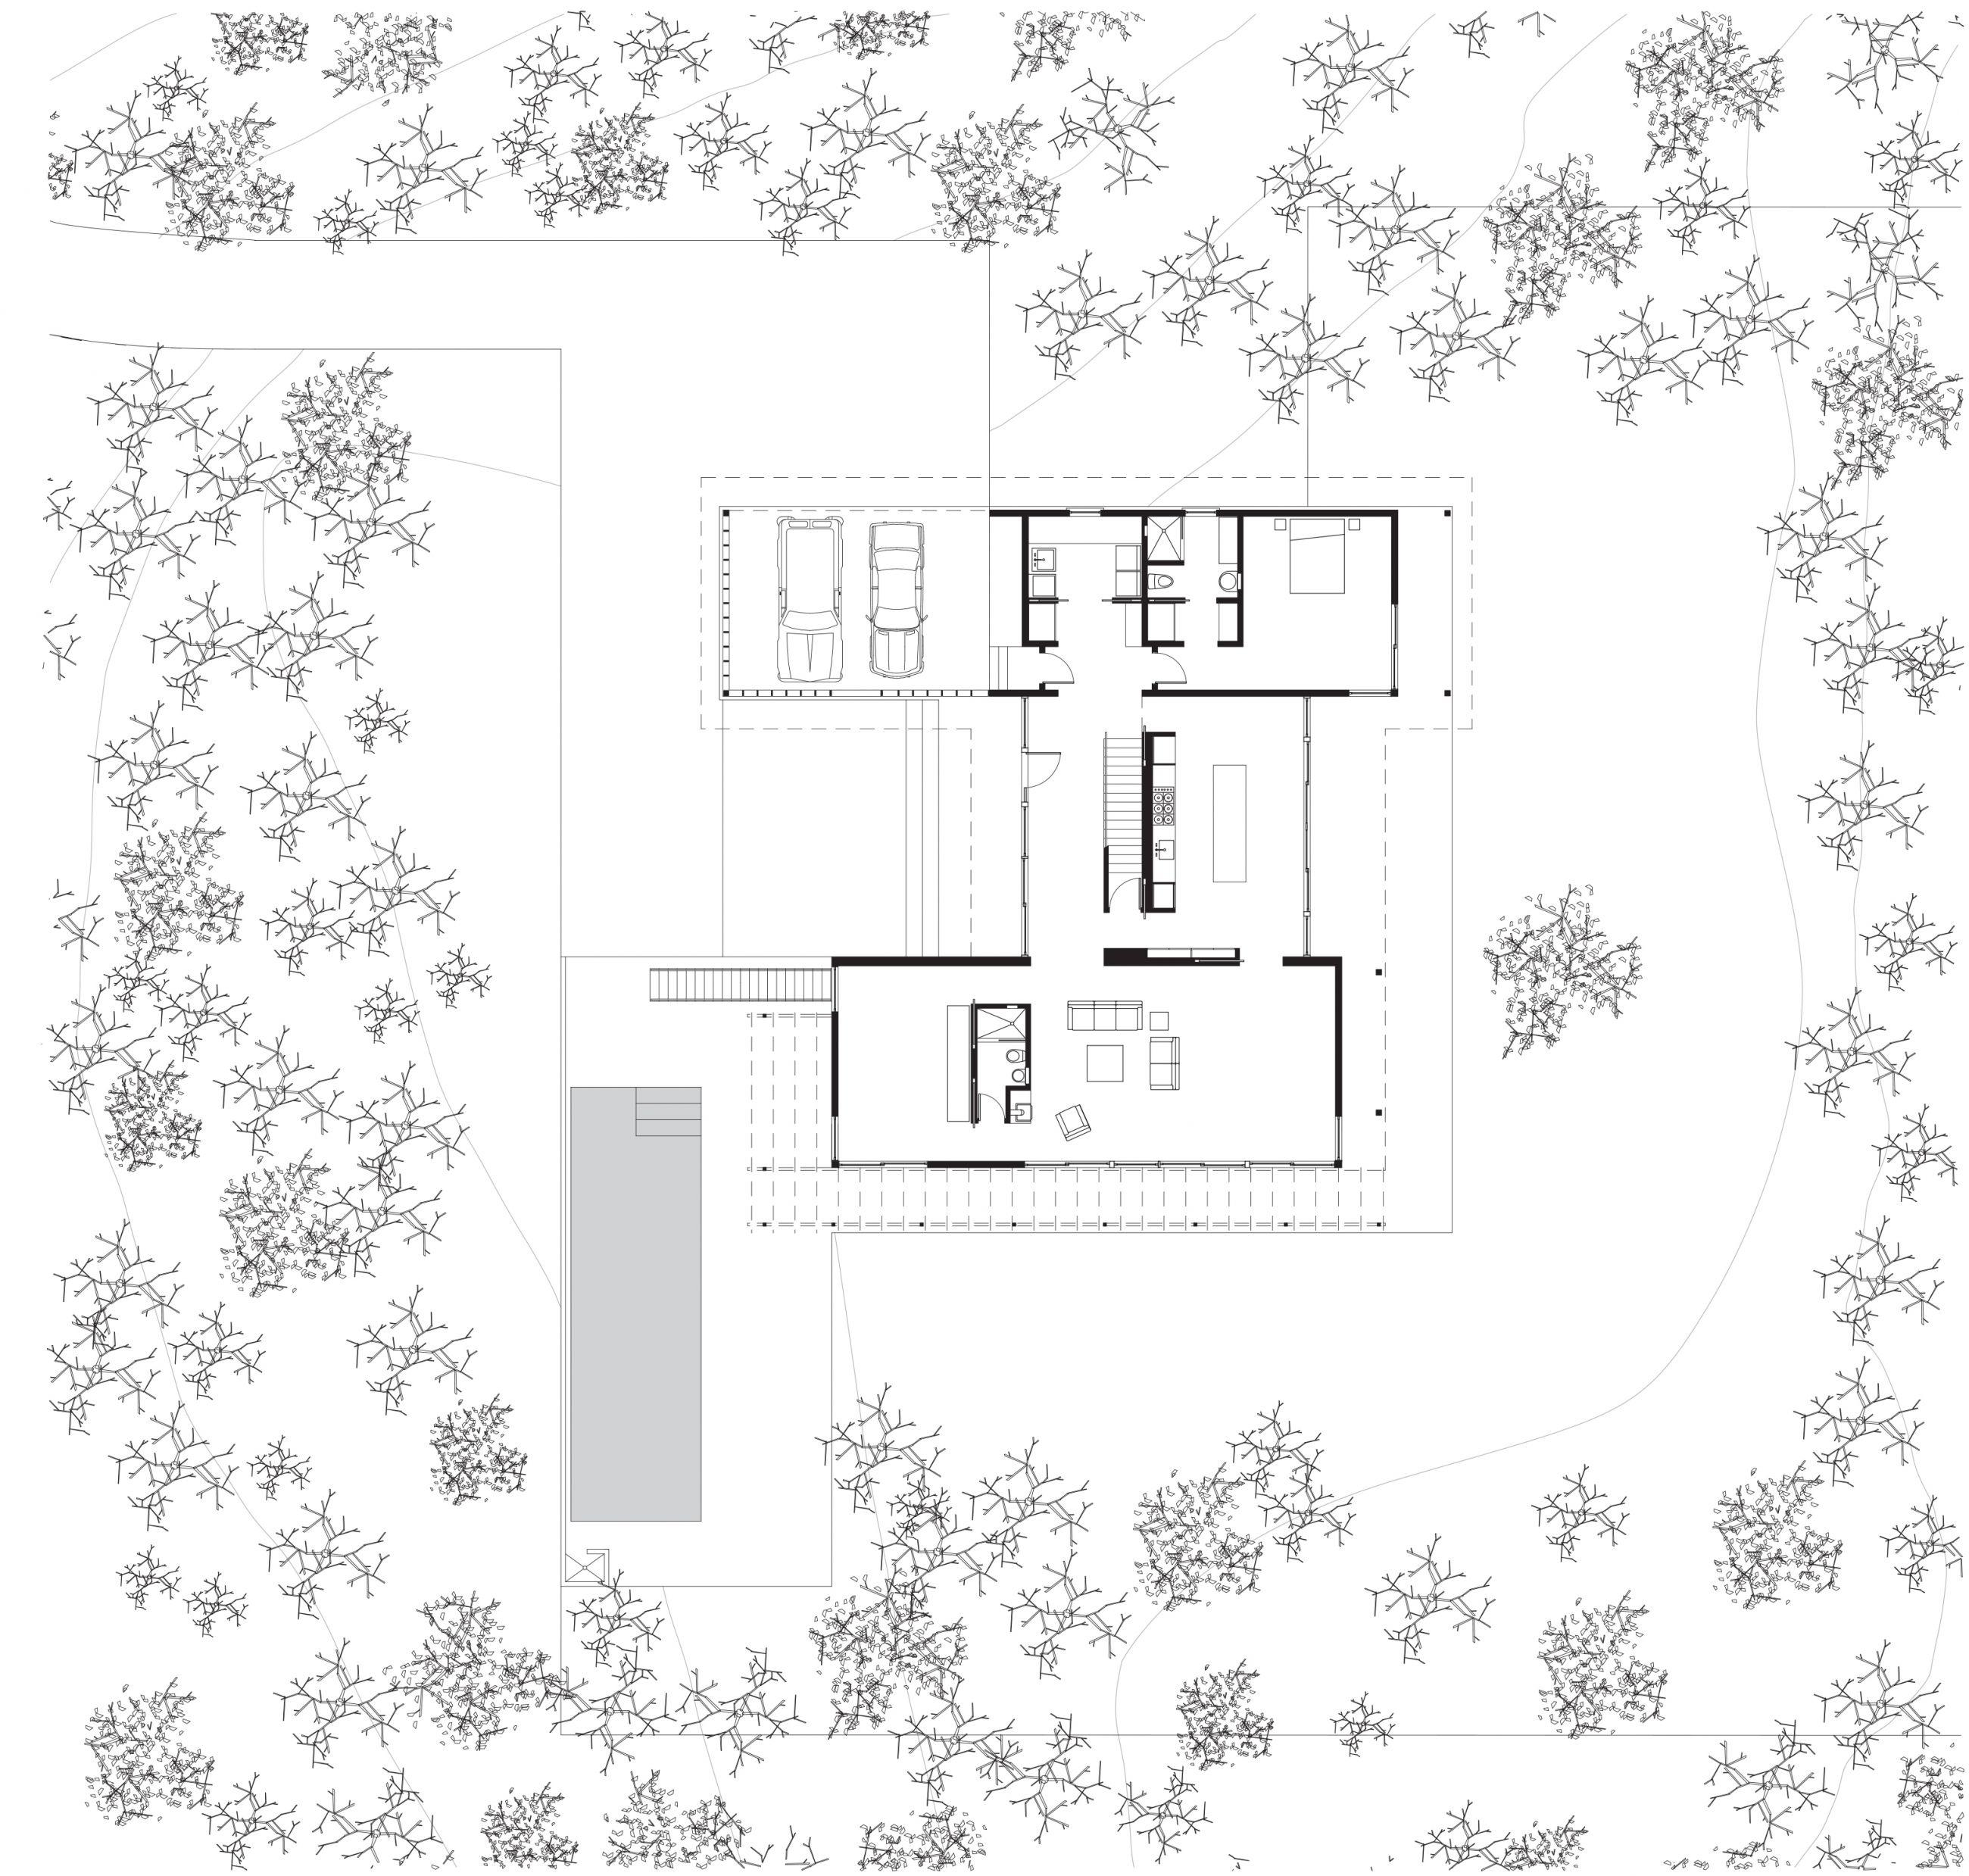 Sag Harbor House Site Plan